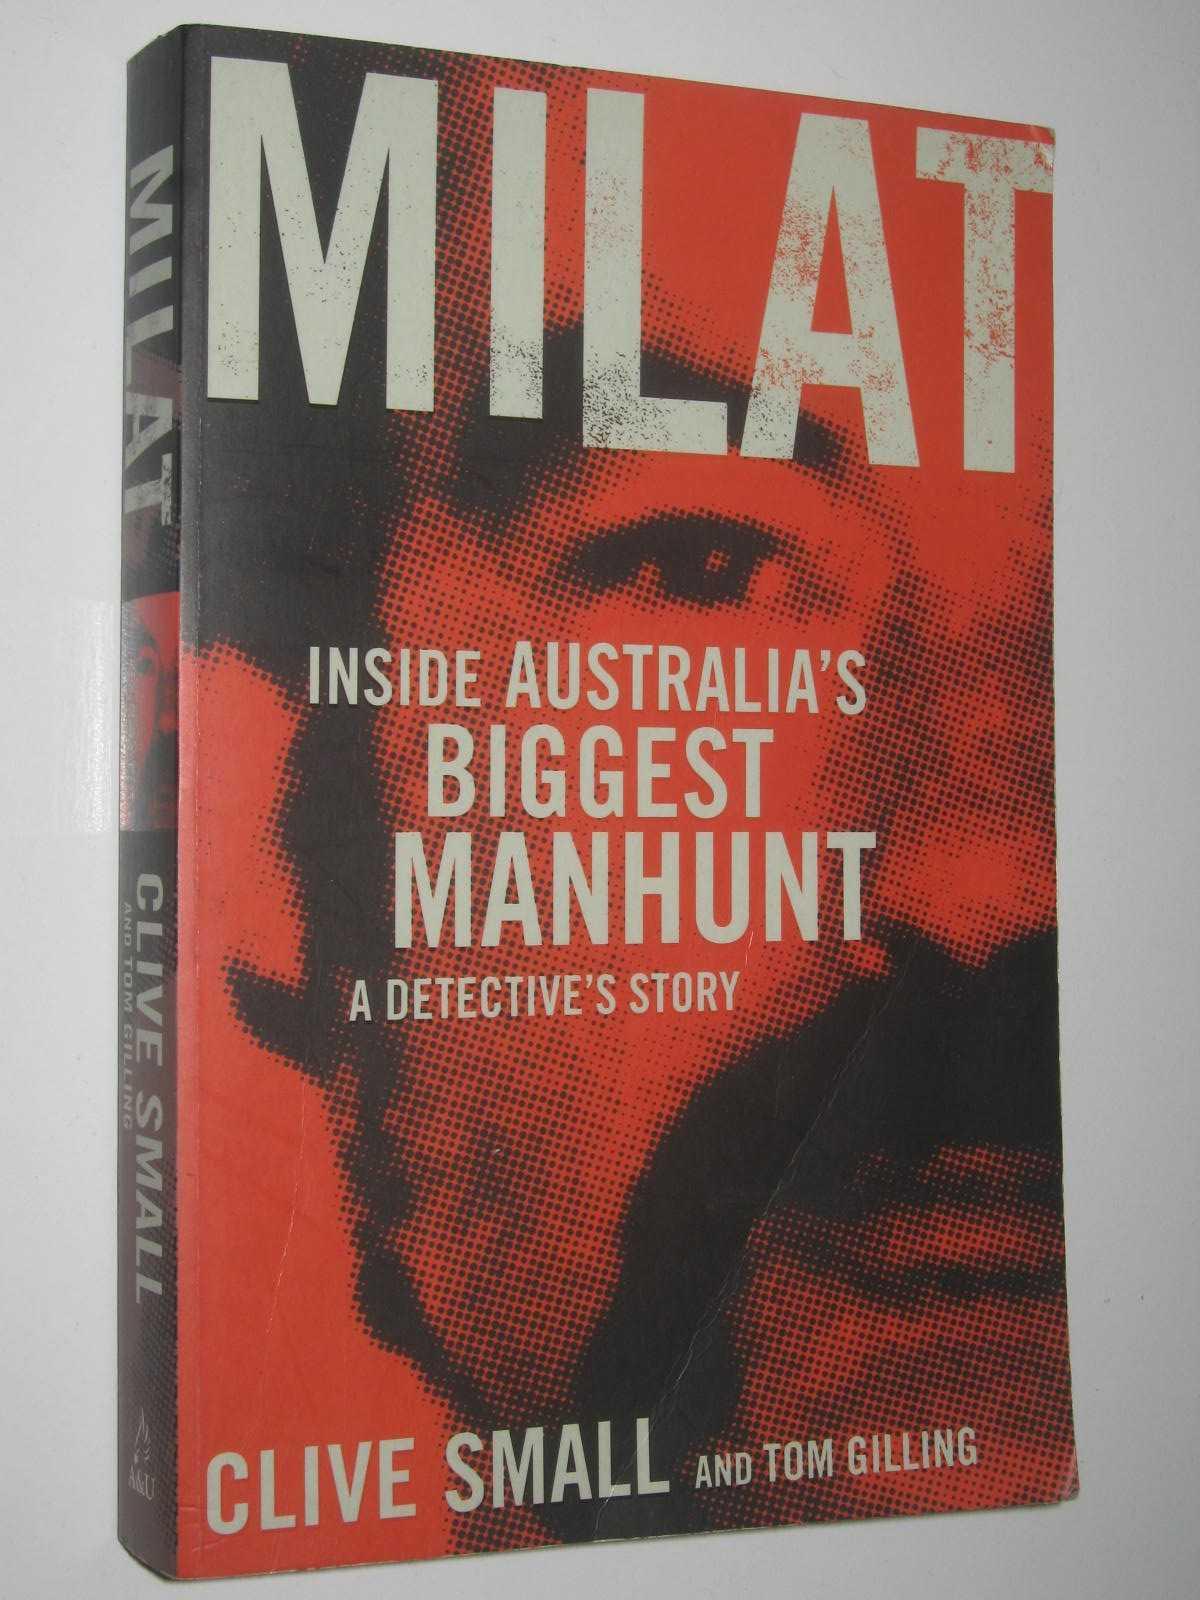 Image for Milat - Inside Australia's Biggest Manhunt : A Dectective's Story